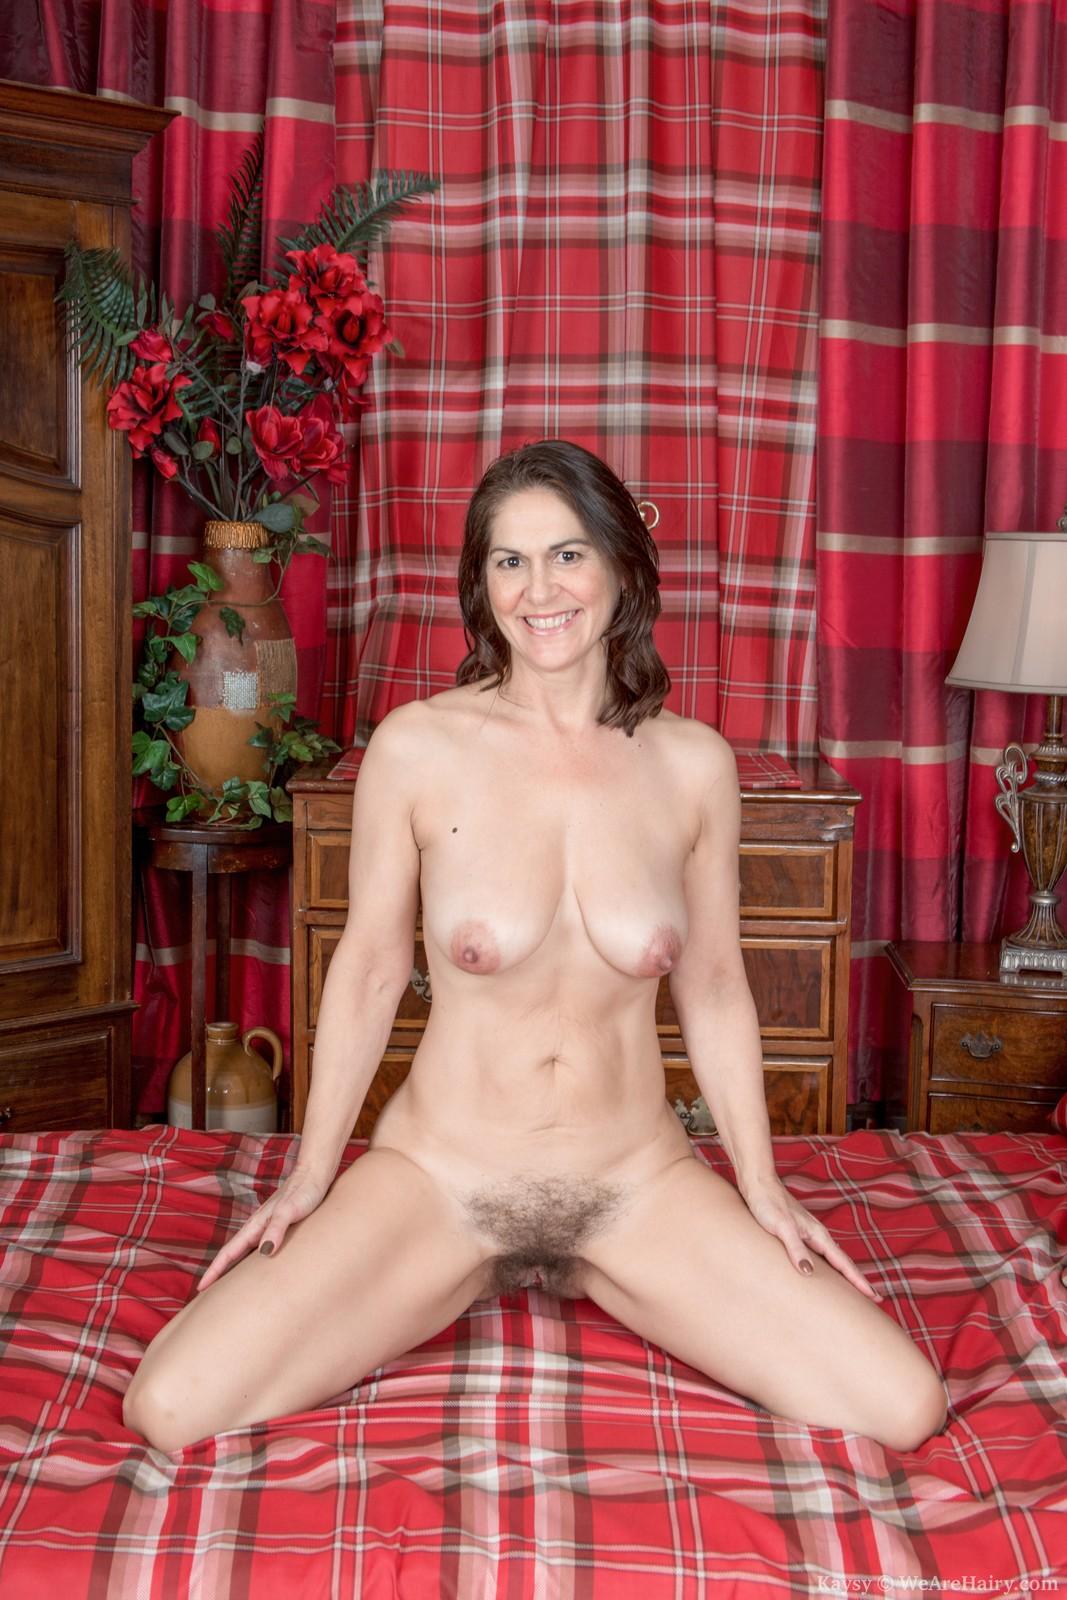 Aunty sexy hidden images